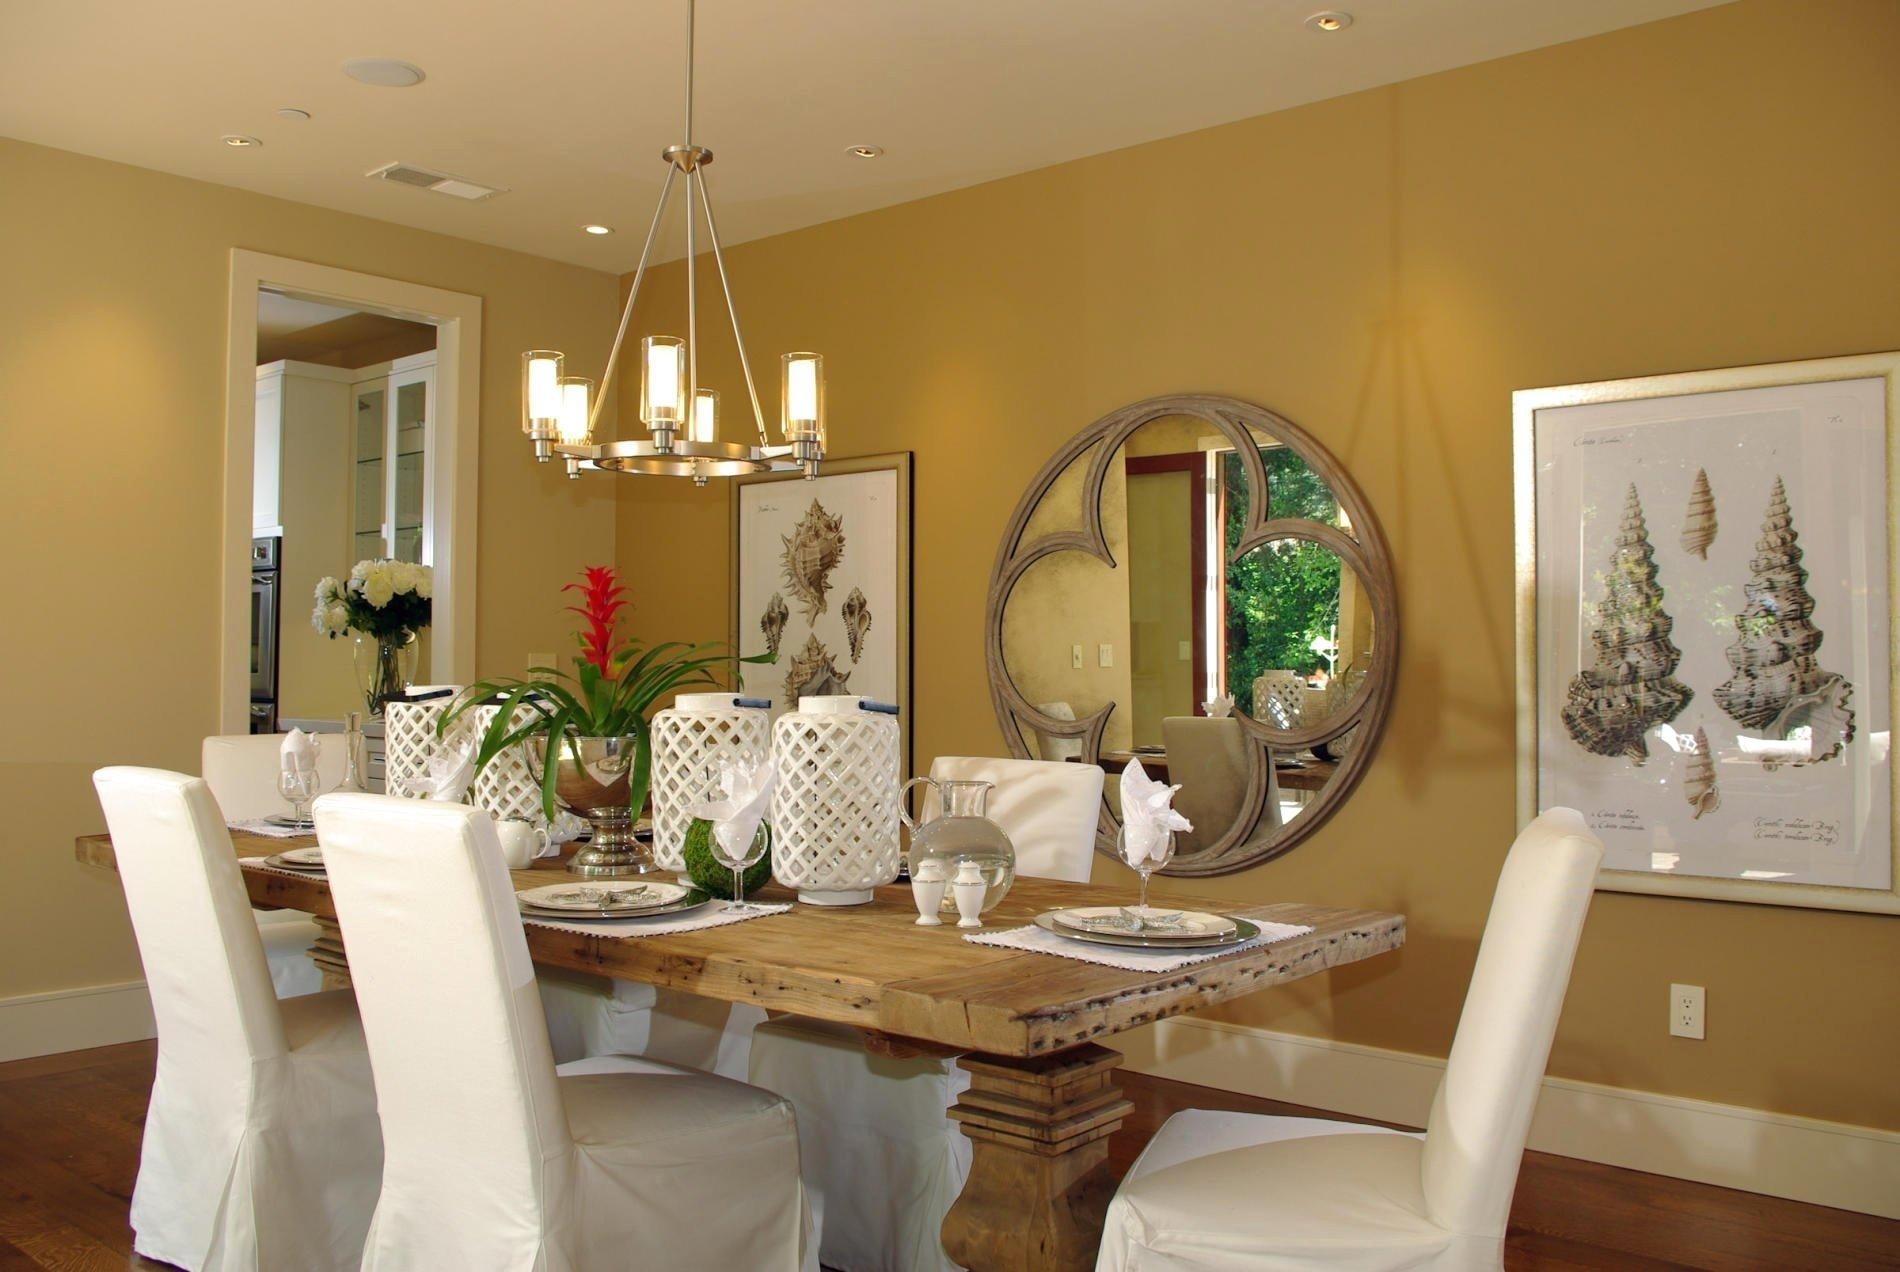 10 Lovable Centerpiece Ideas For Dining Room Table floral centerpieces for dining tables dining room ideas 2020